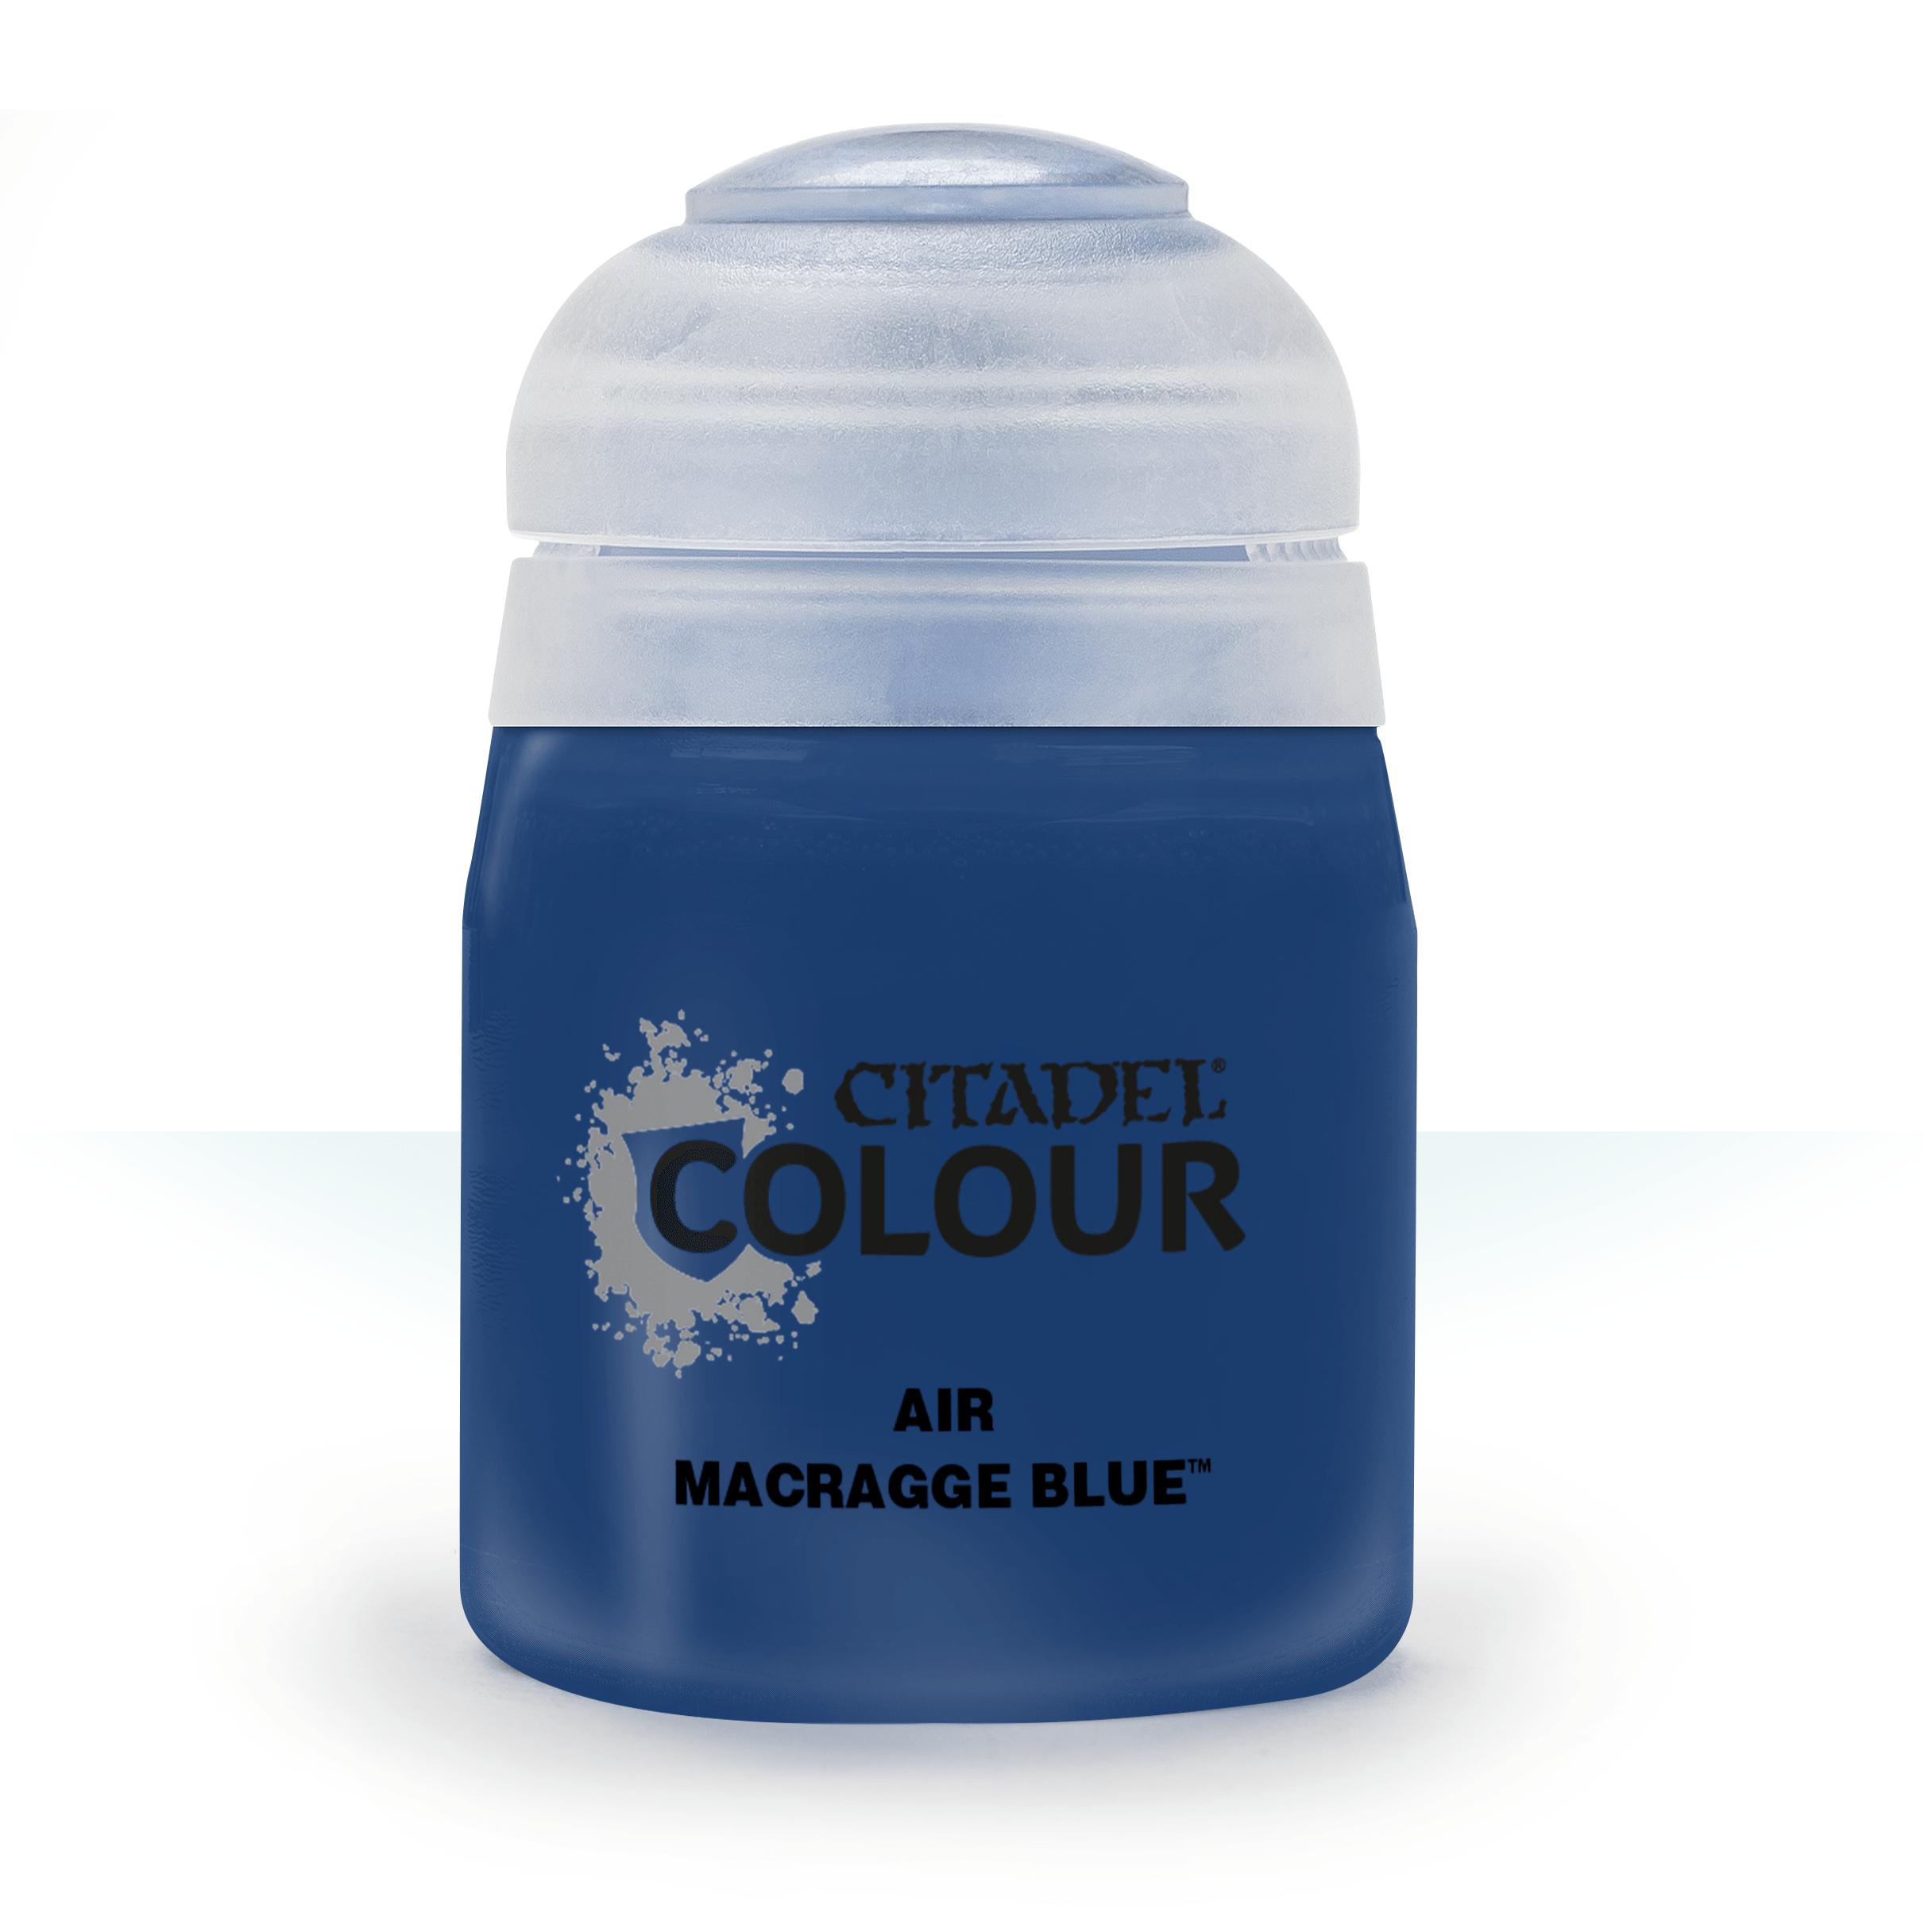 Macragge Blue, Citadel Air 24ml